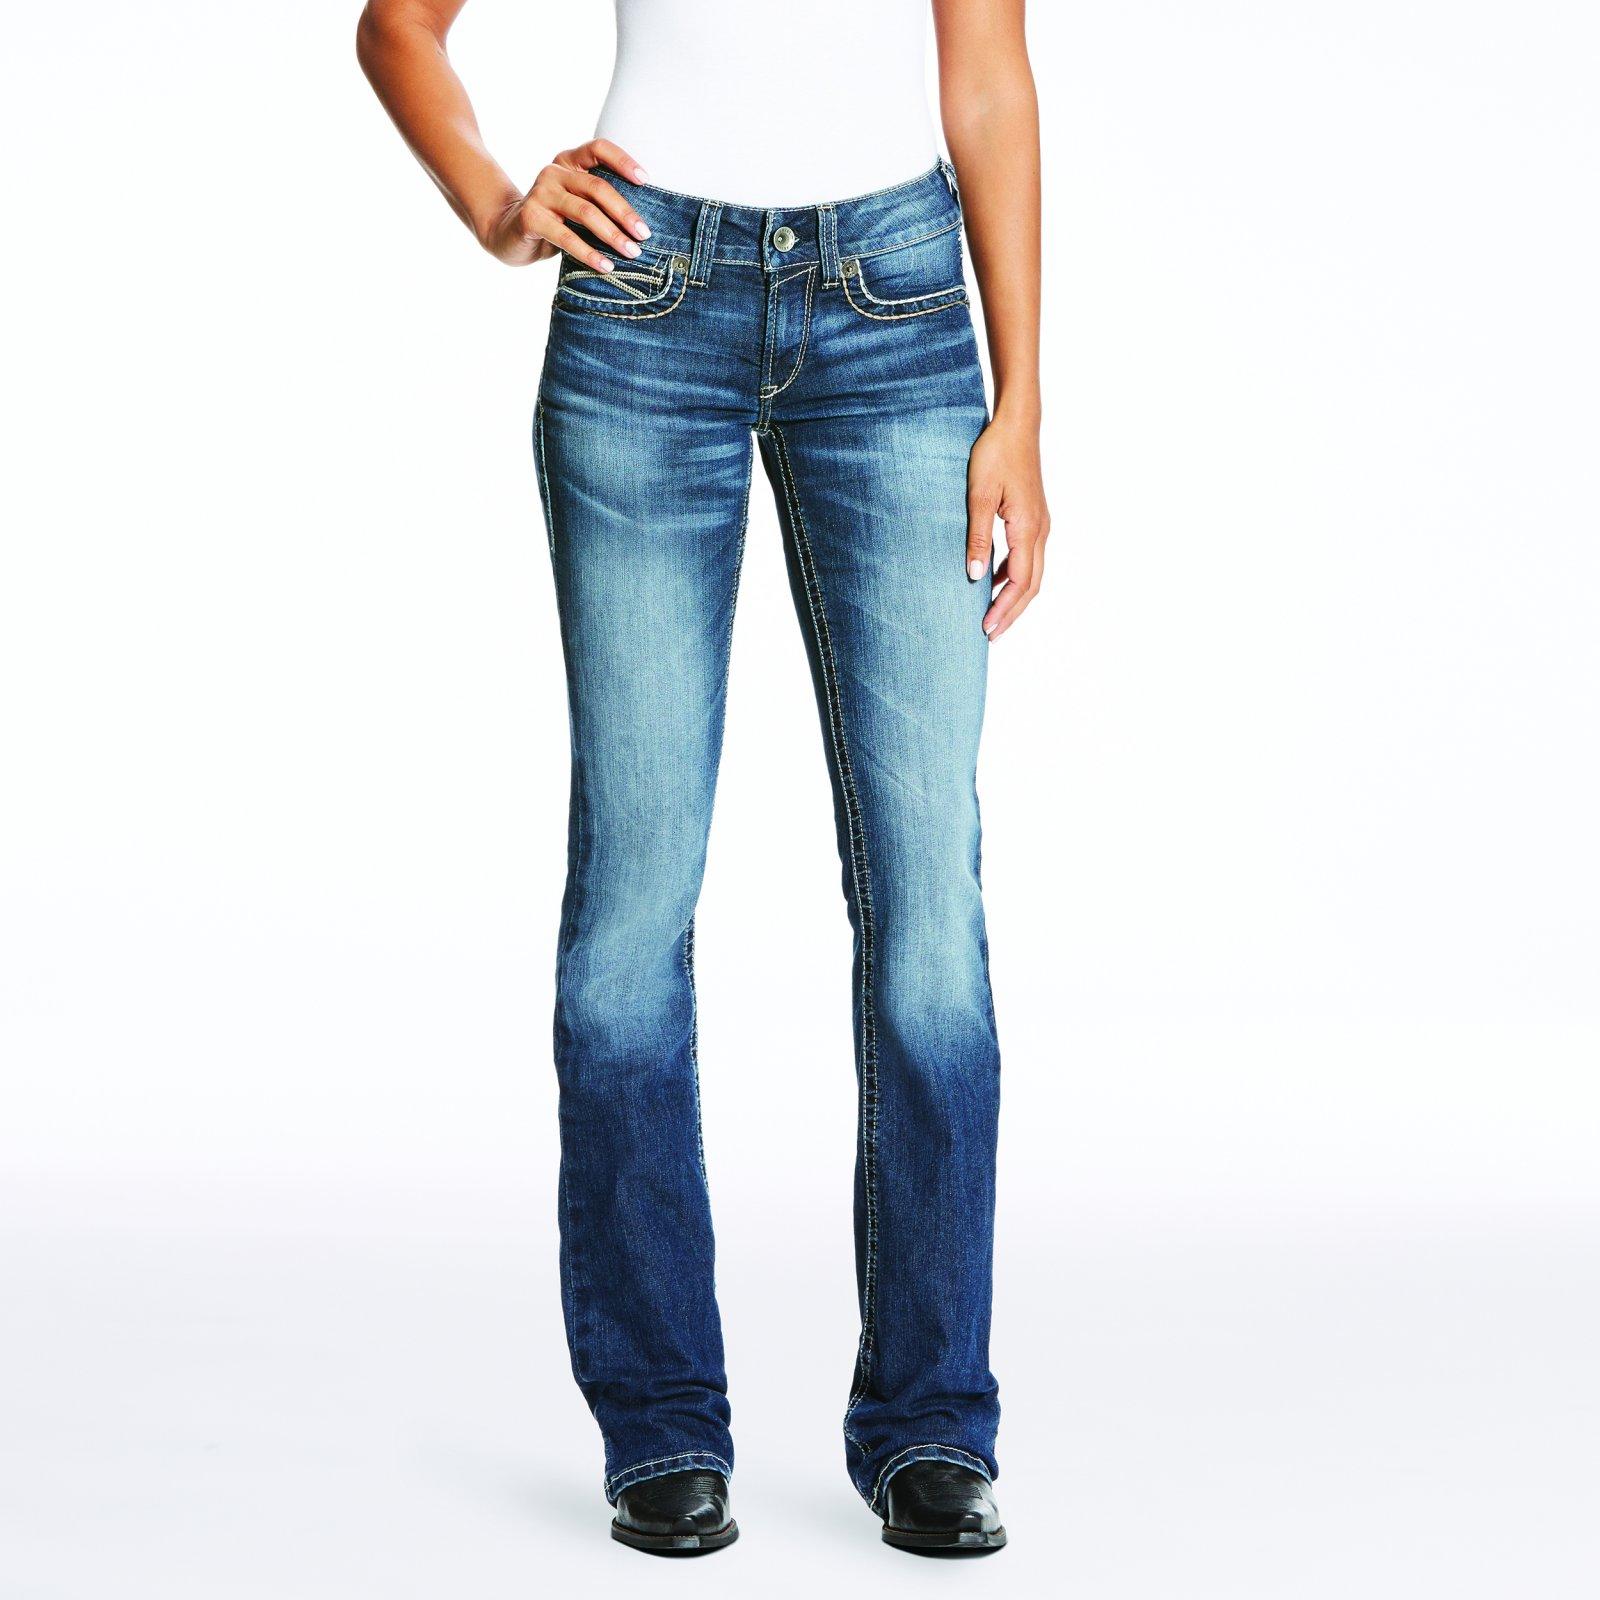 Ladies Diamond Jean from Ariat